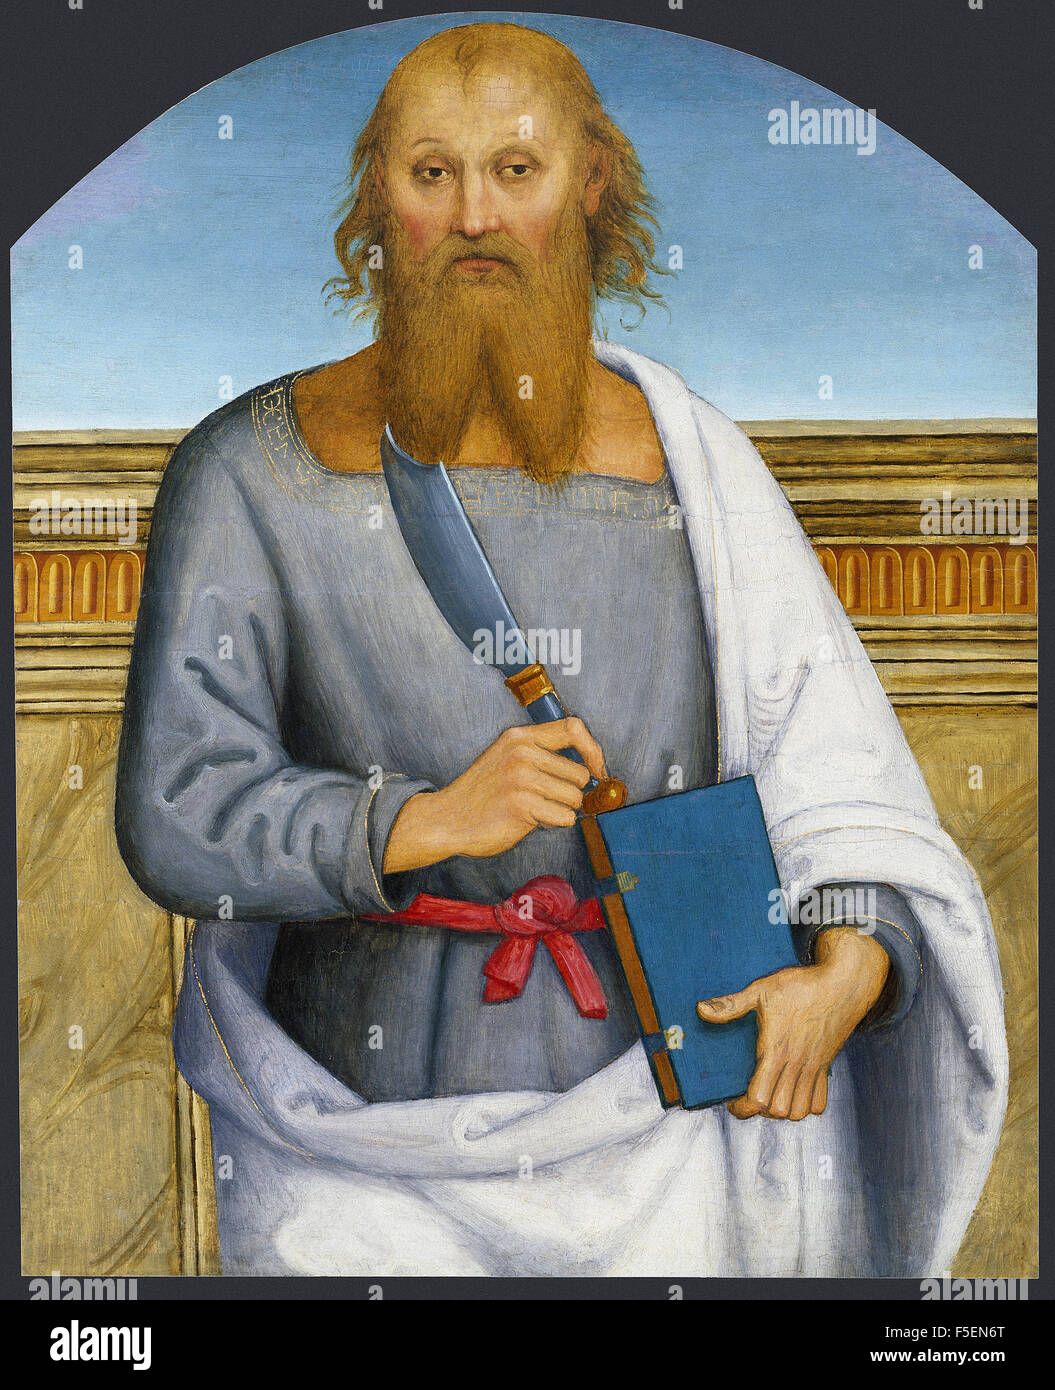 Pietro Perugino - Saint Bartholomew - Stock Image